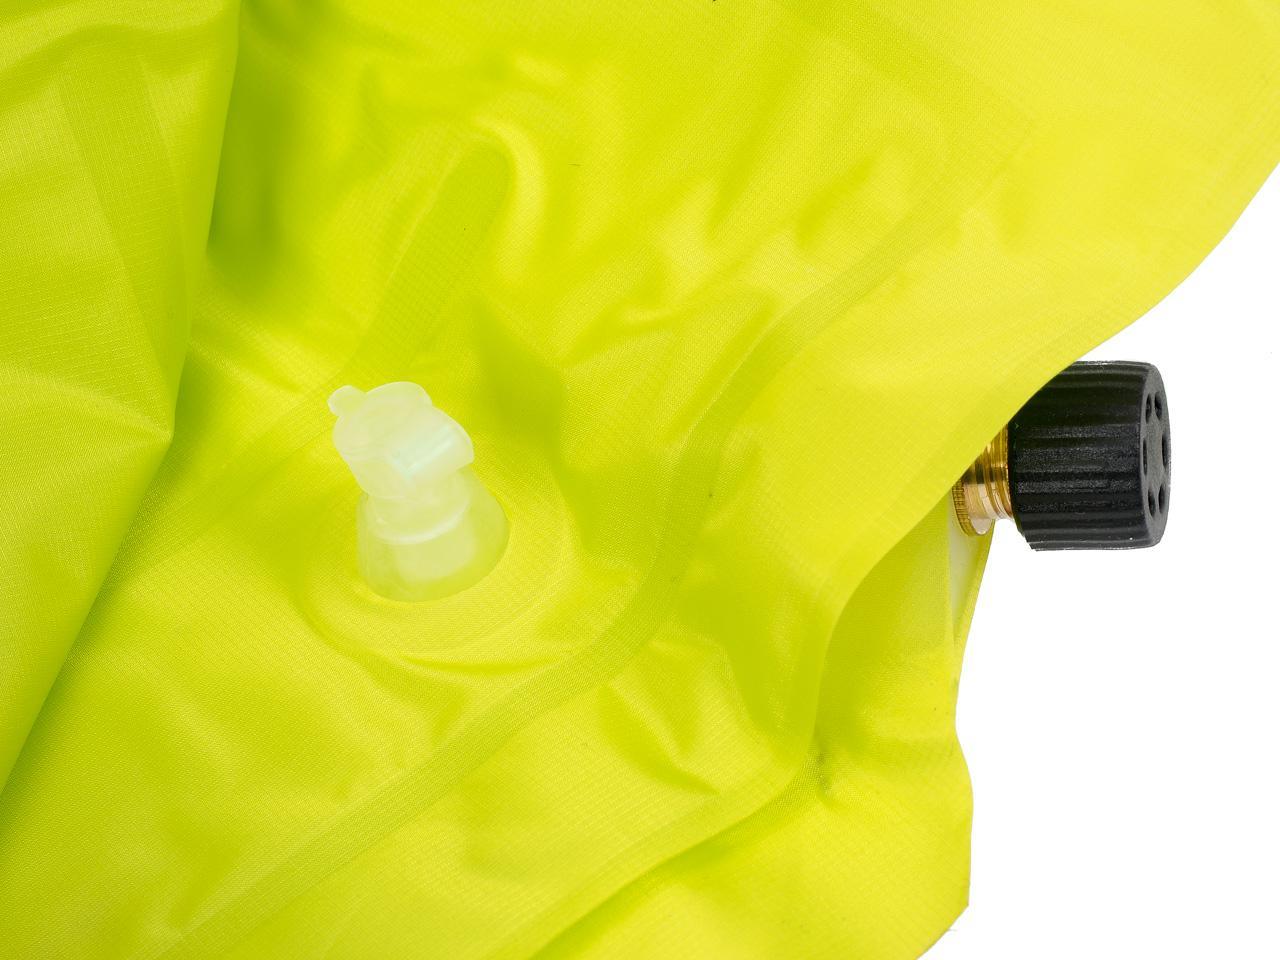 Matelas-auto-gonflant-Camp-Essential-light-mat-Vert-15069-Neuf miniature 2